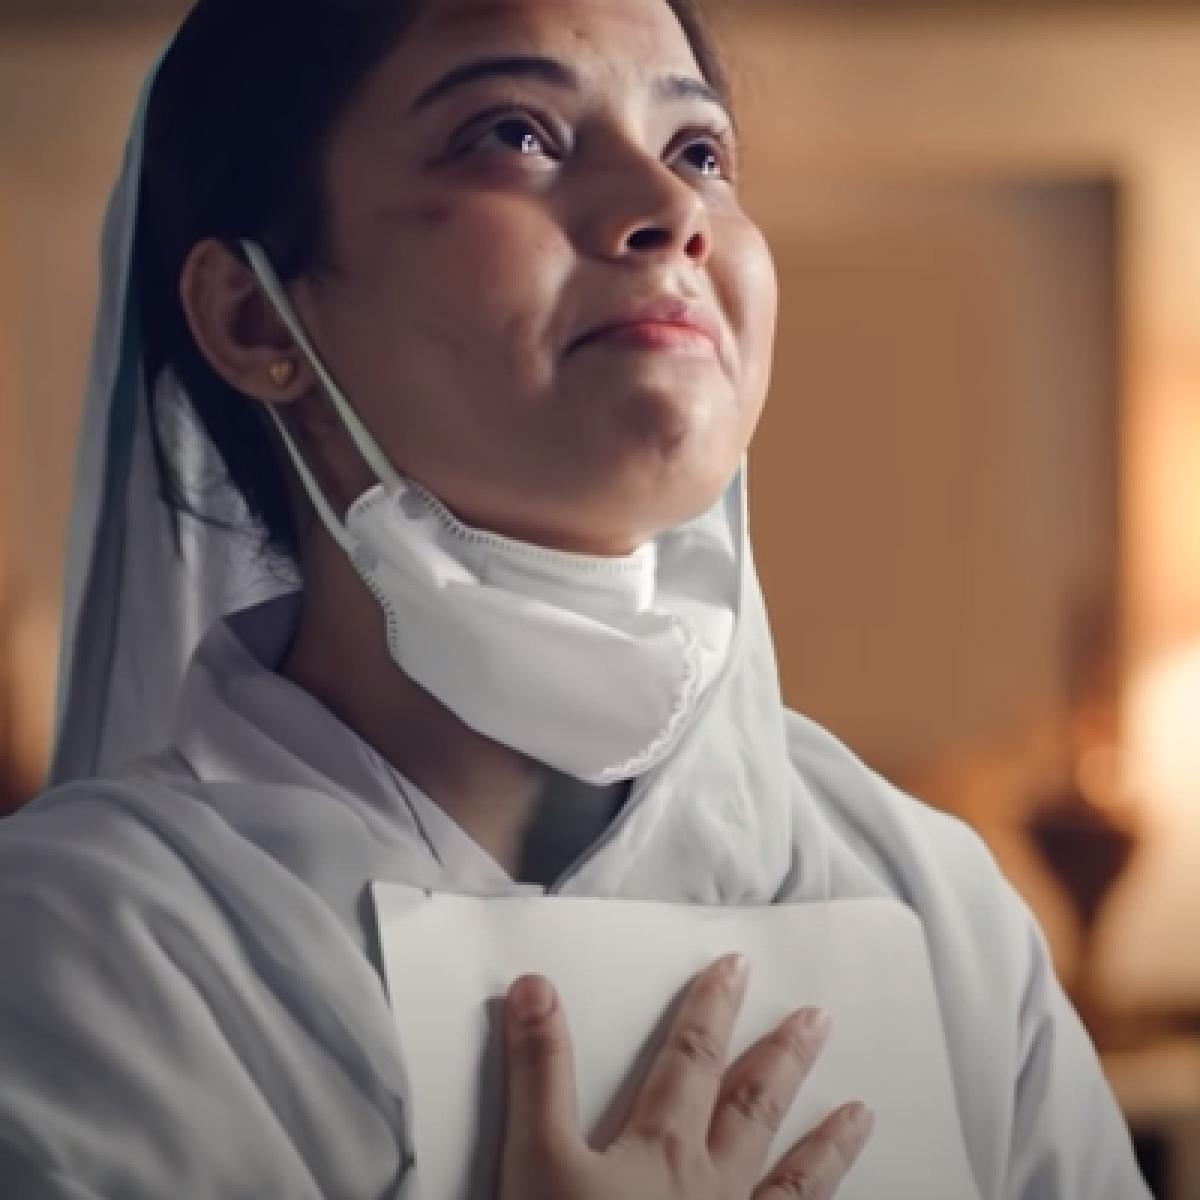 Surf Excel's Ramadan 2020 commercial pays tribute to 'superheroes' fighting coronavirus